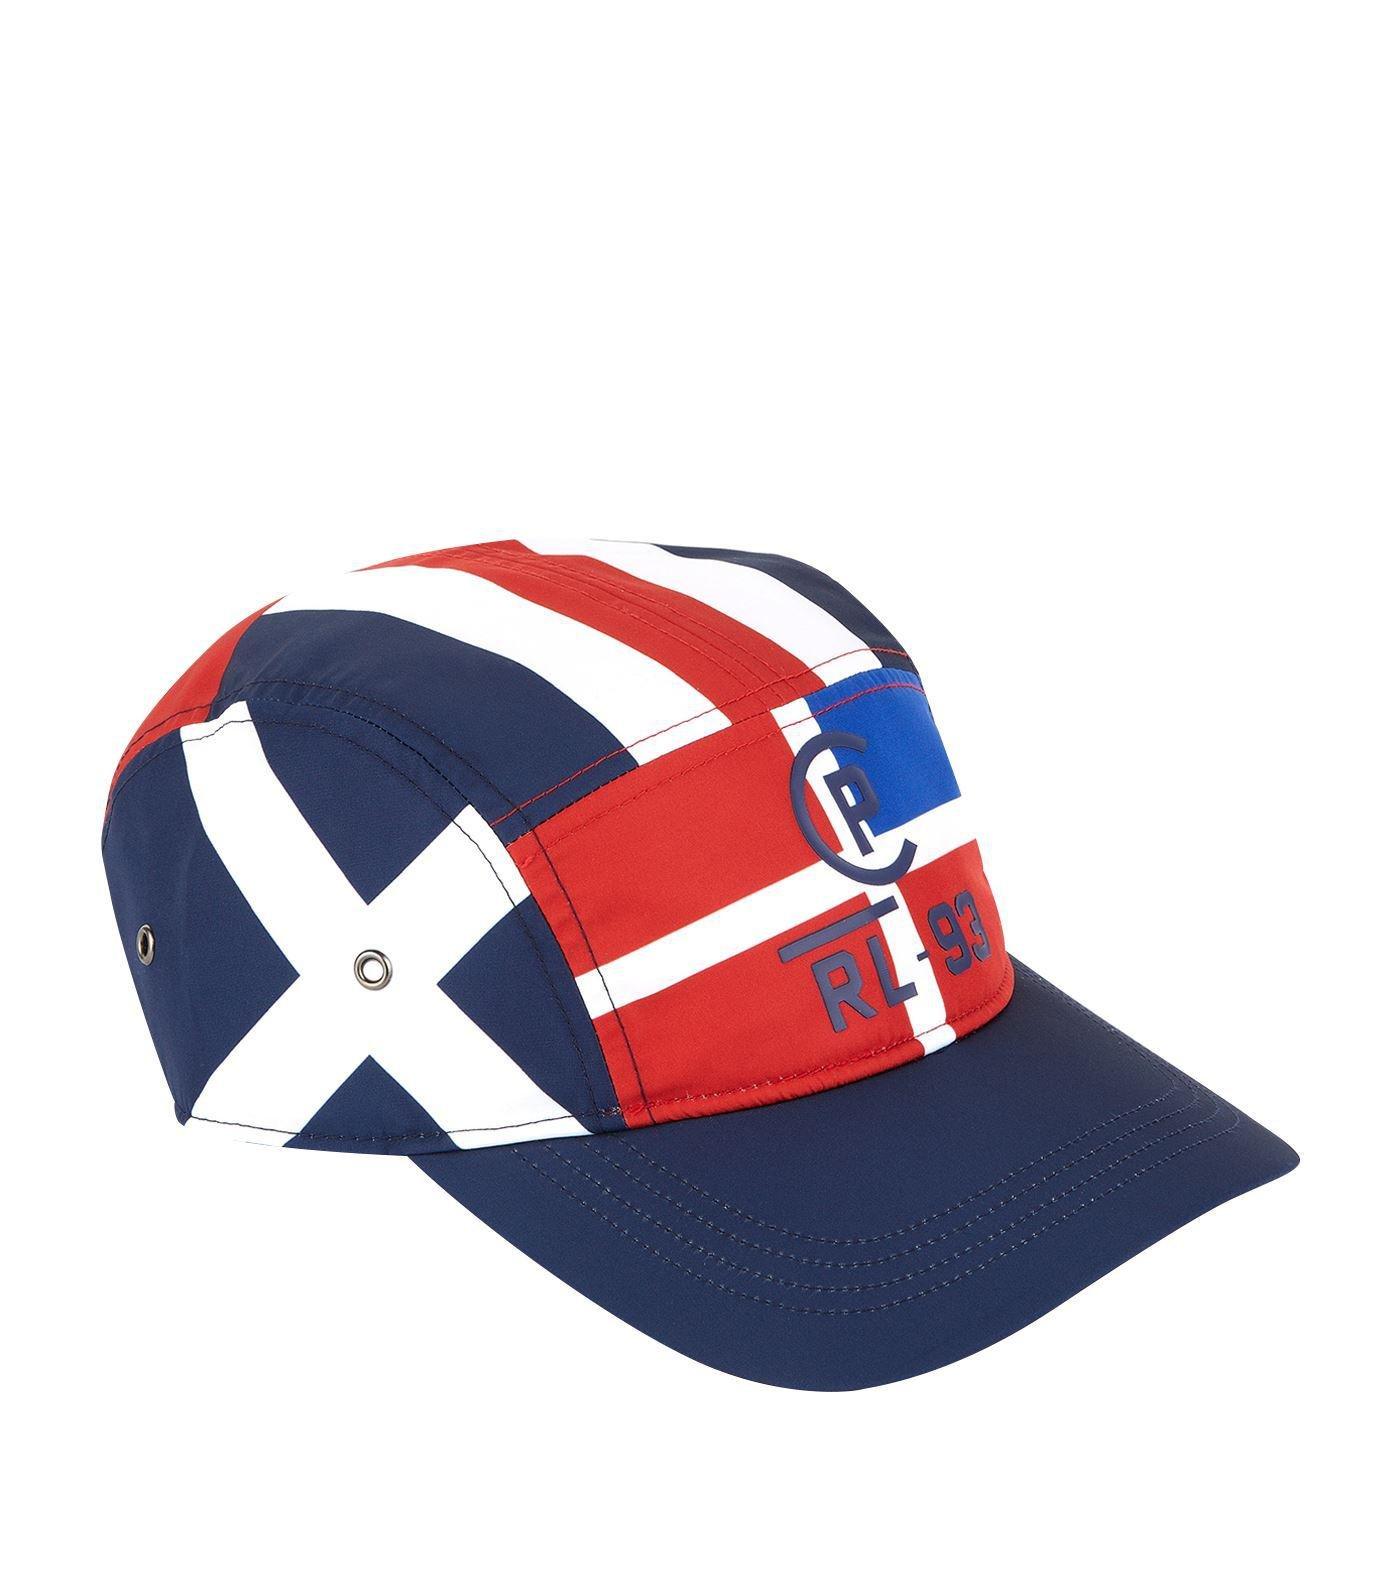 473453e4f4142 Polo Ralph Lauren Sailing Flag Print Cap in Blue for Men - Lyst